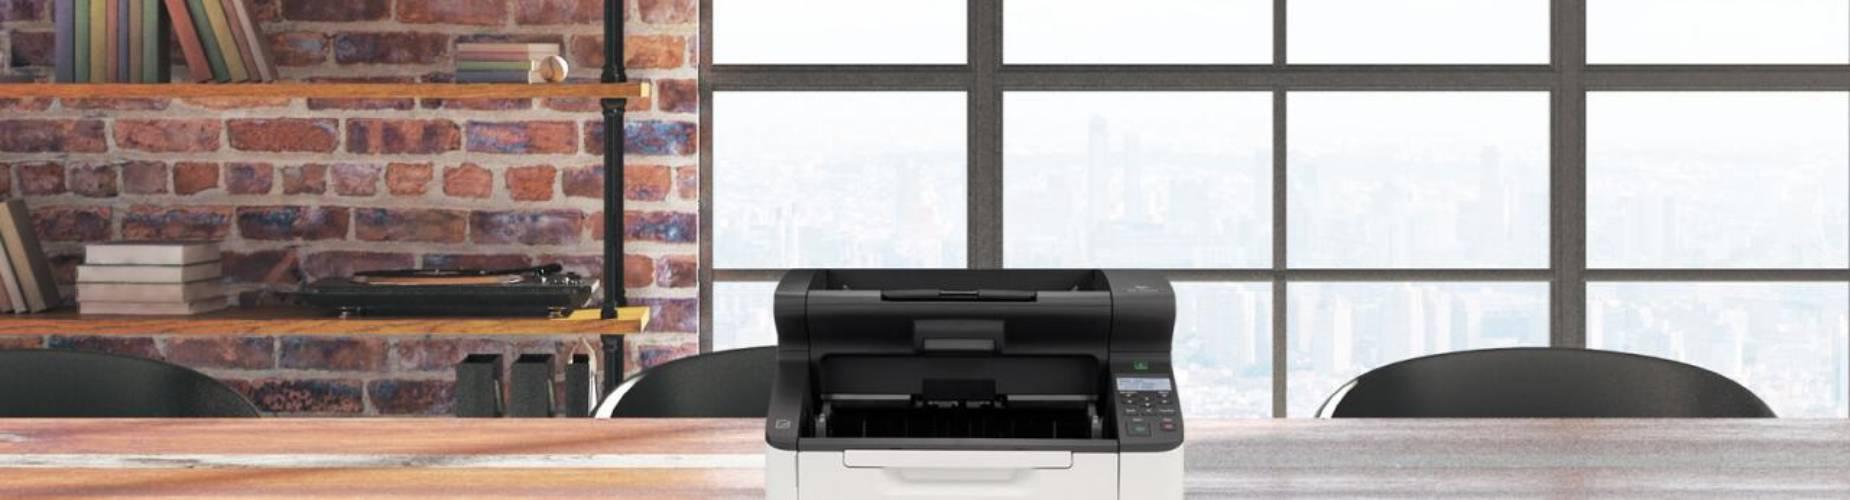 Scanner on an office desk